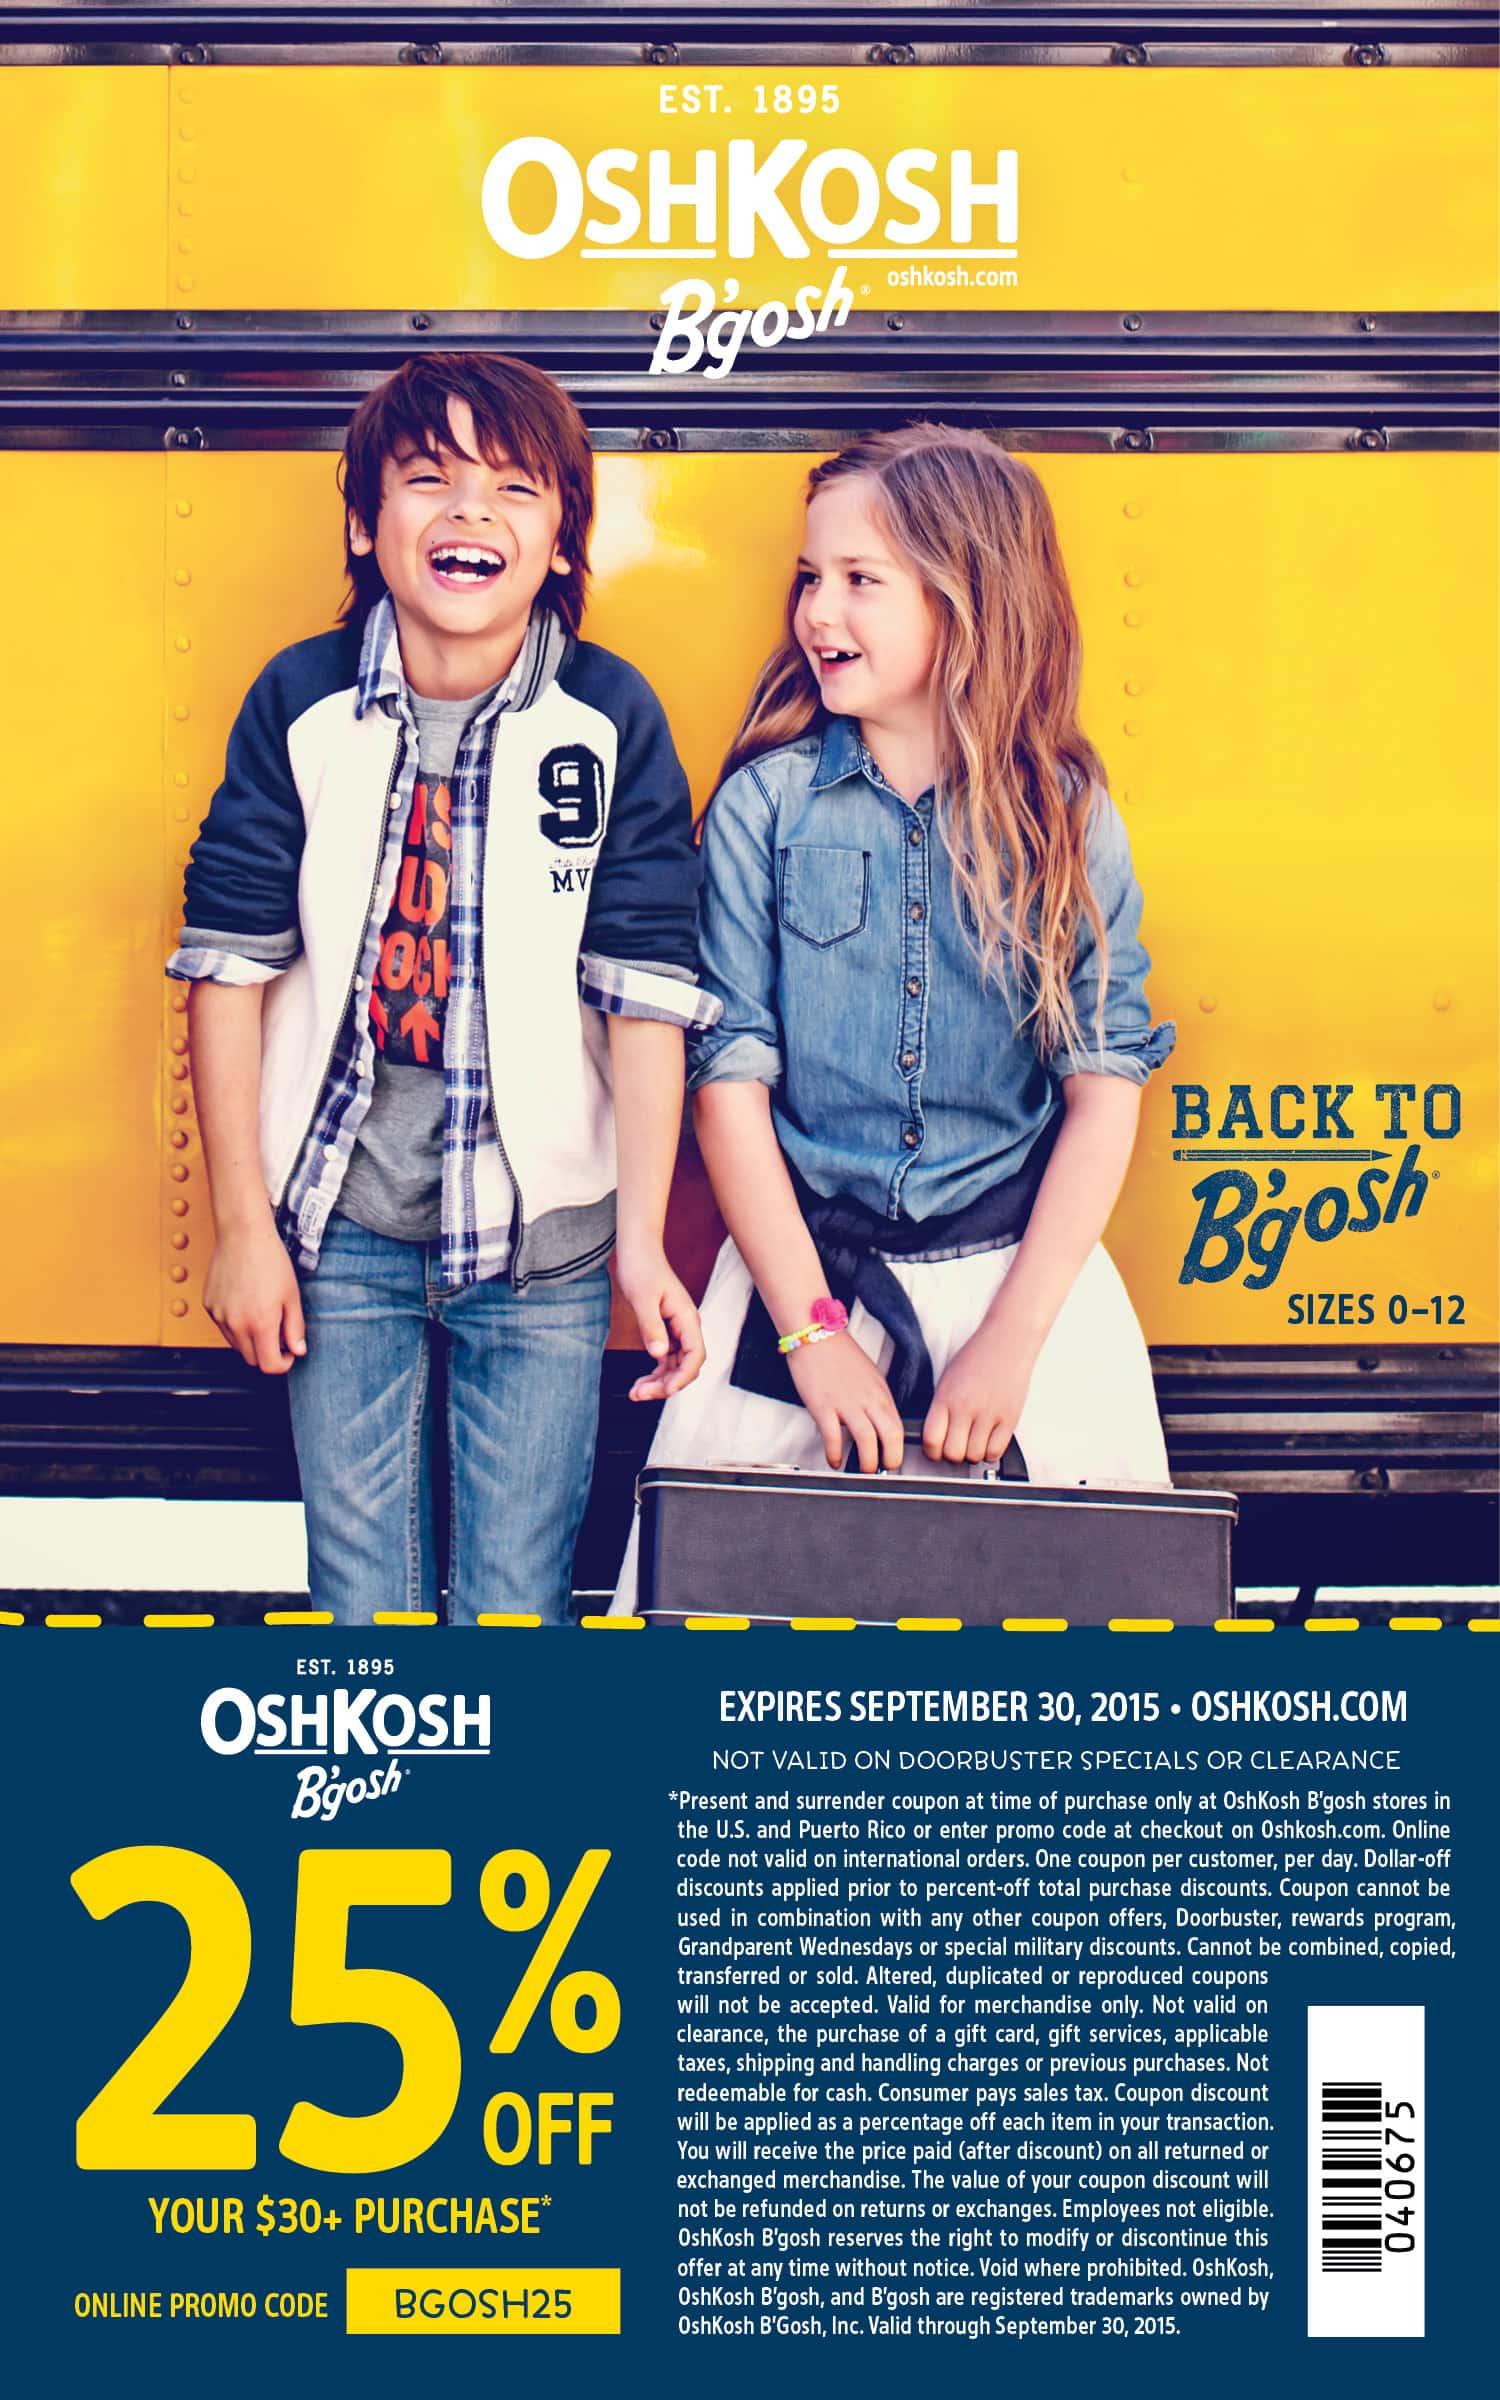 Save 25% on your $30+ purchase at Oshkosh Bgosh until September 30